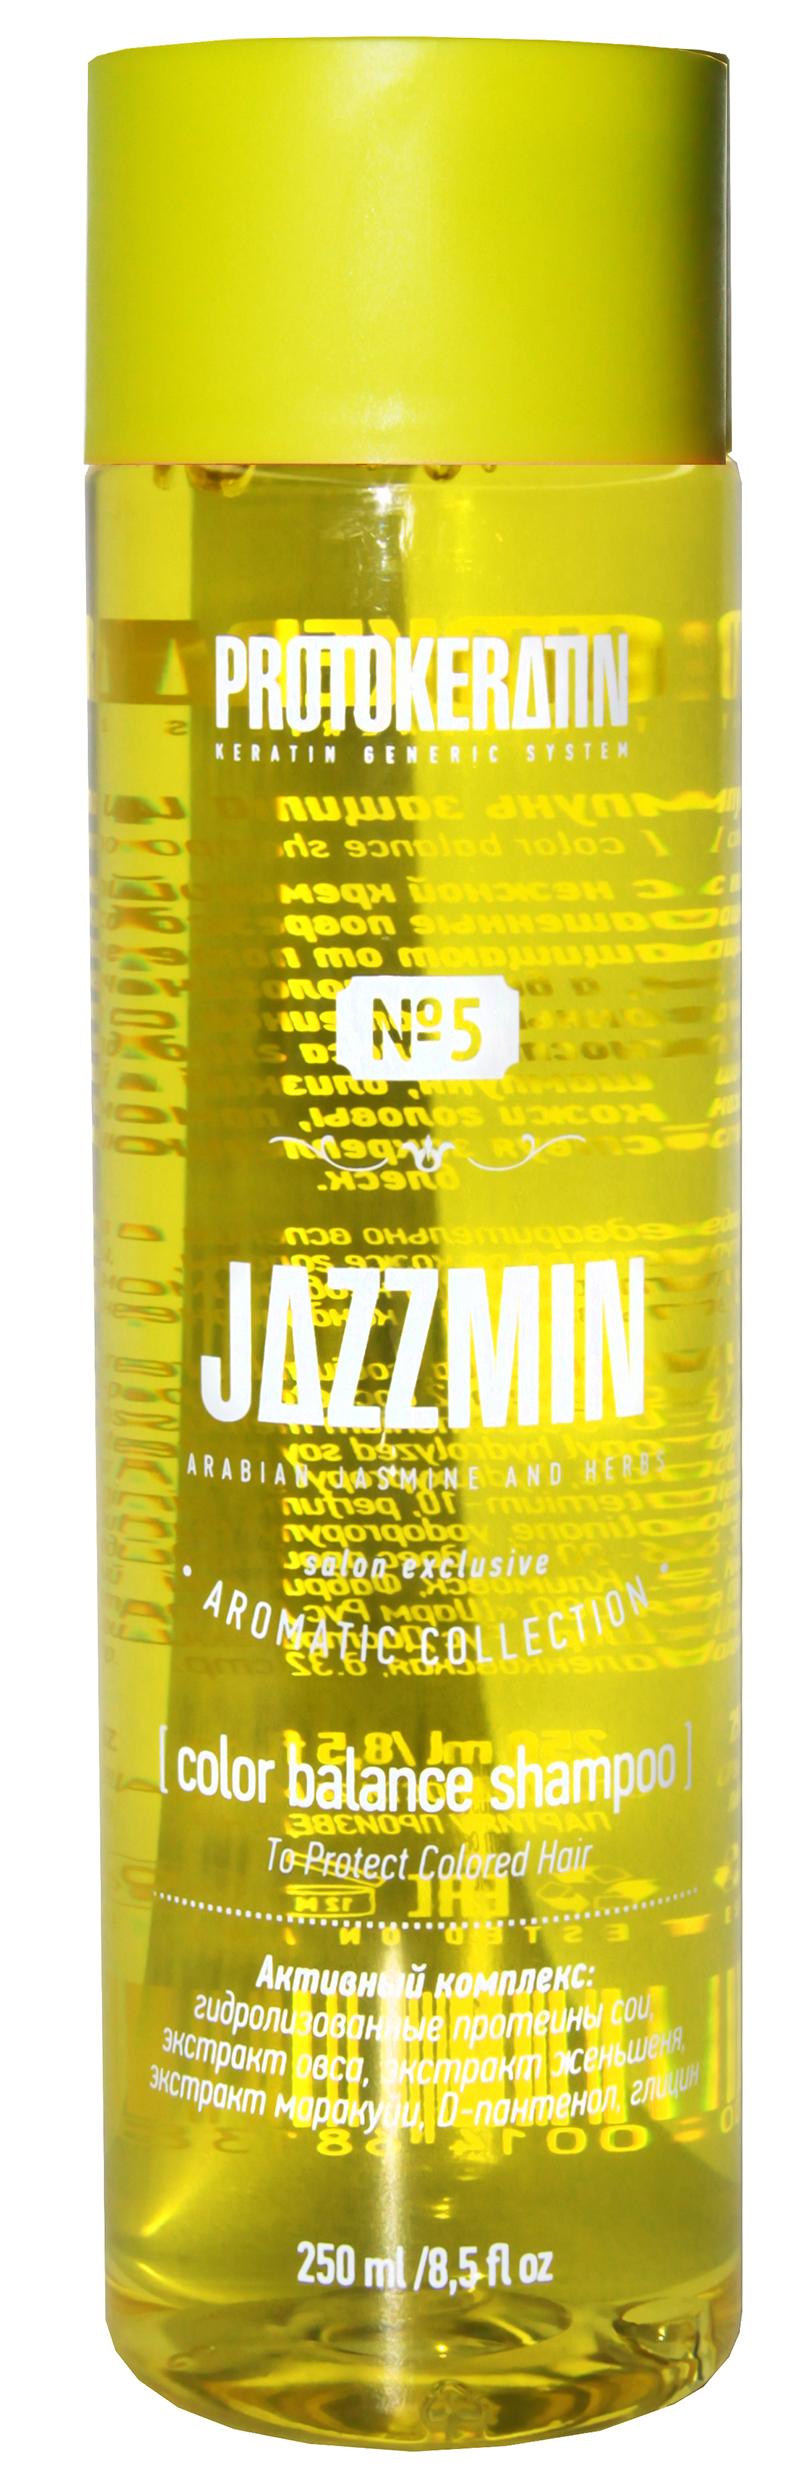 PROTOKERATIN Шампунь защита цвета JAZZMIN / color balance shampoo